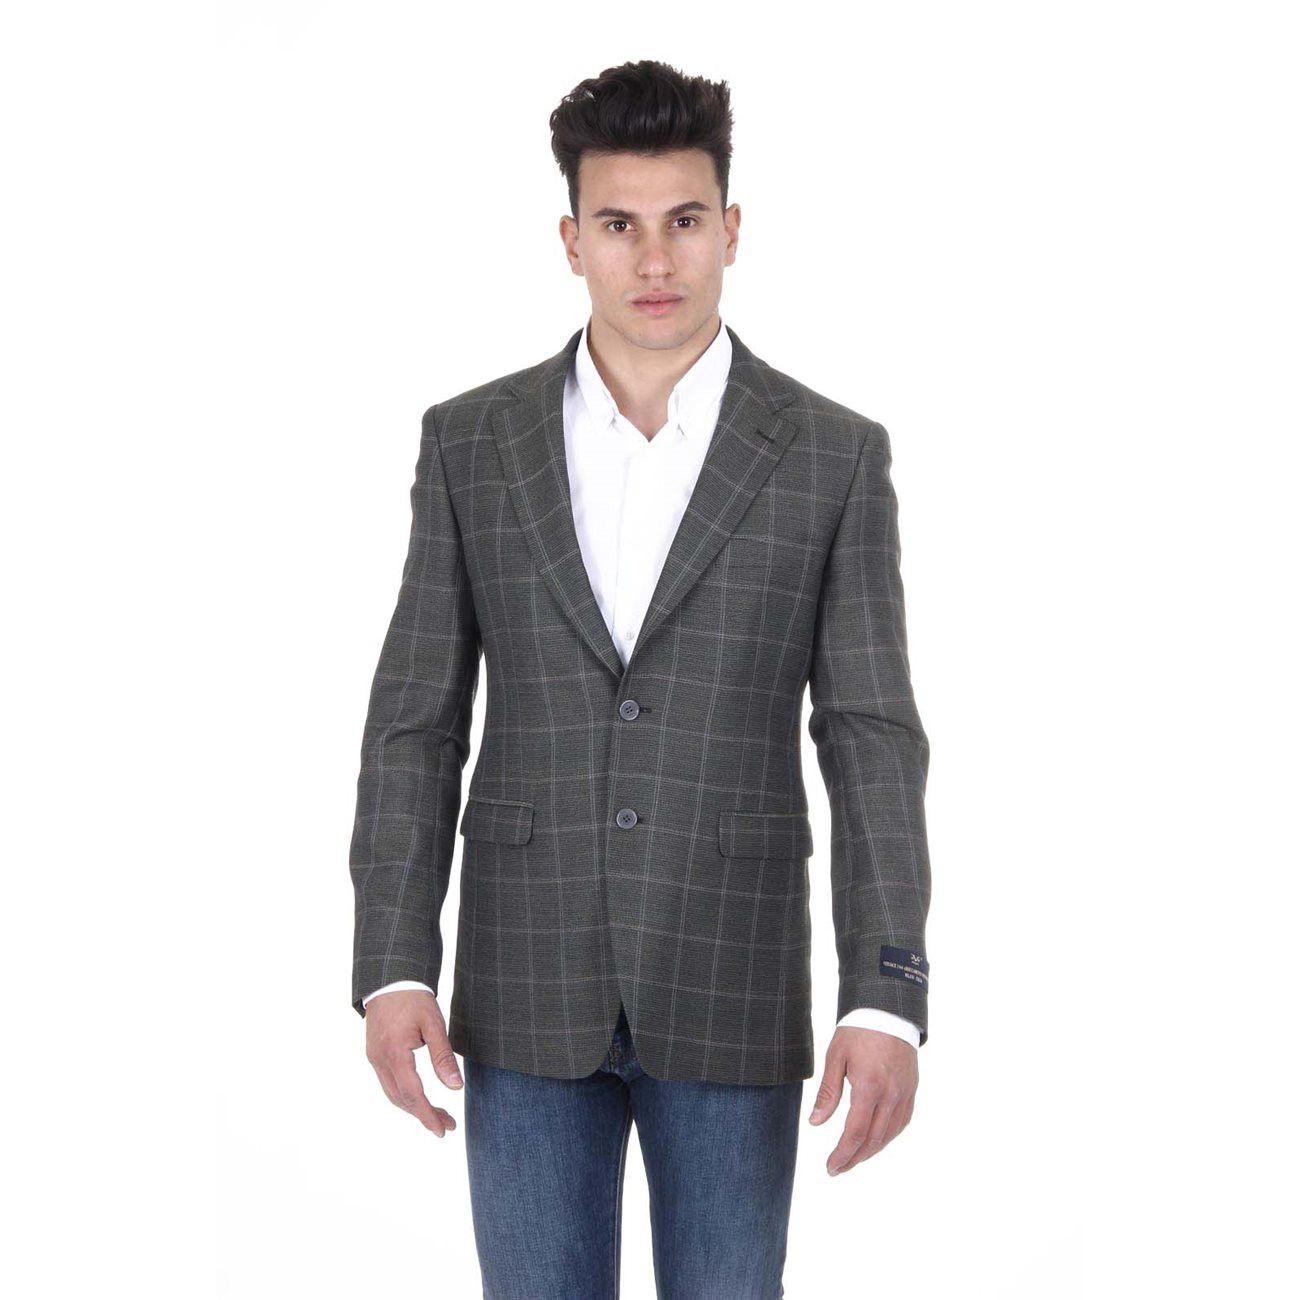 Versace 19.69 Abbigliamento Sportivo Milano Italia Mens Jacket CLAK 2B - 118/A VERDE - MILITARY GREEN